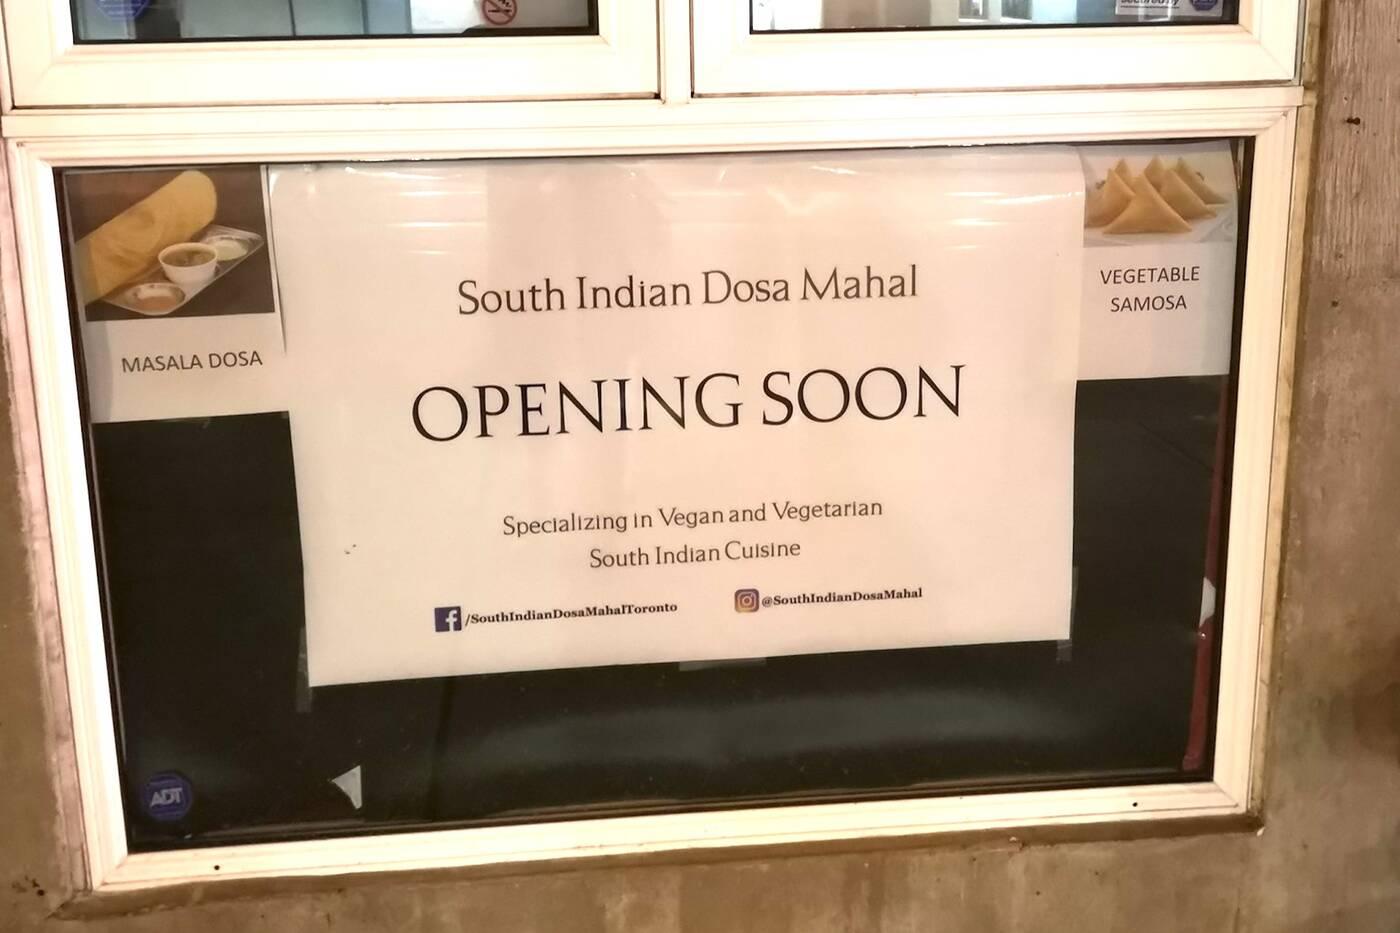 south indian dosa mahal